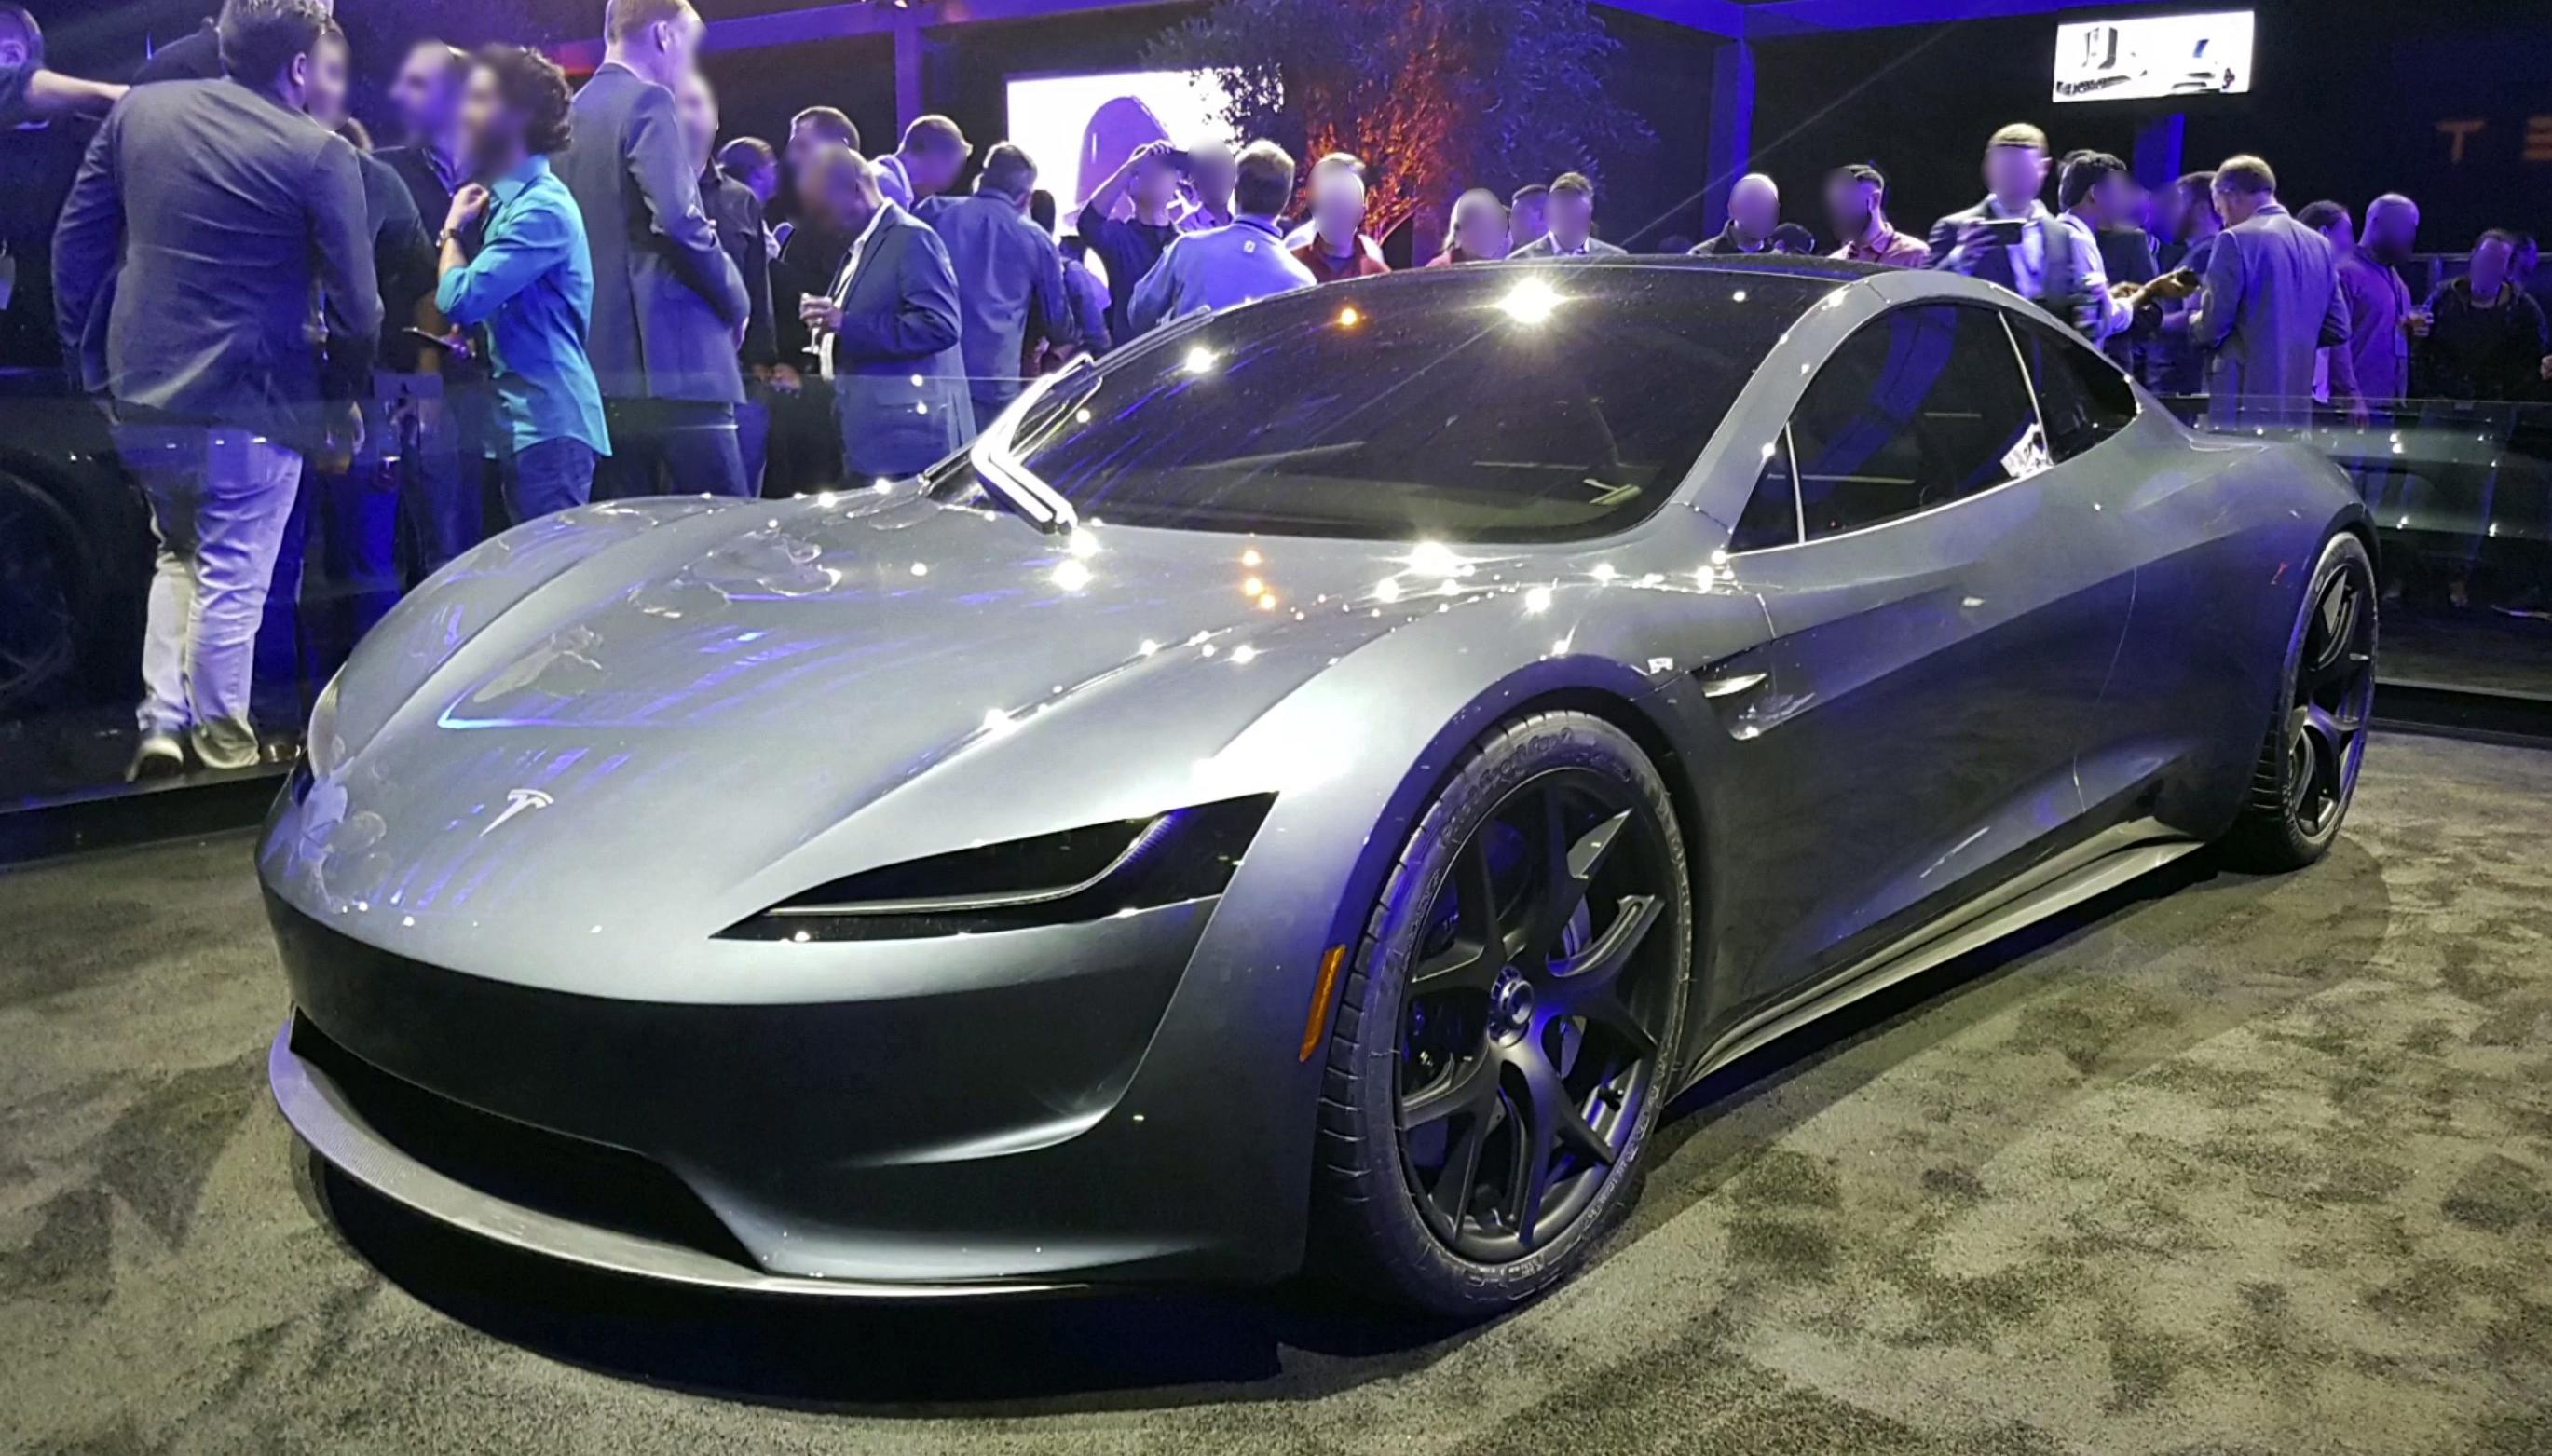 La Tesla è una bolla? Bene, Elon Musk lancia la Roadster 2